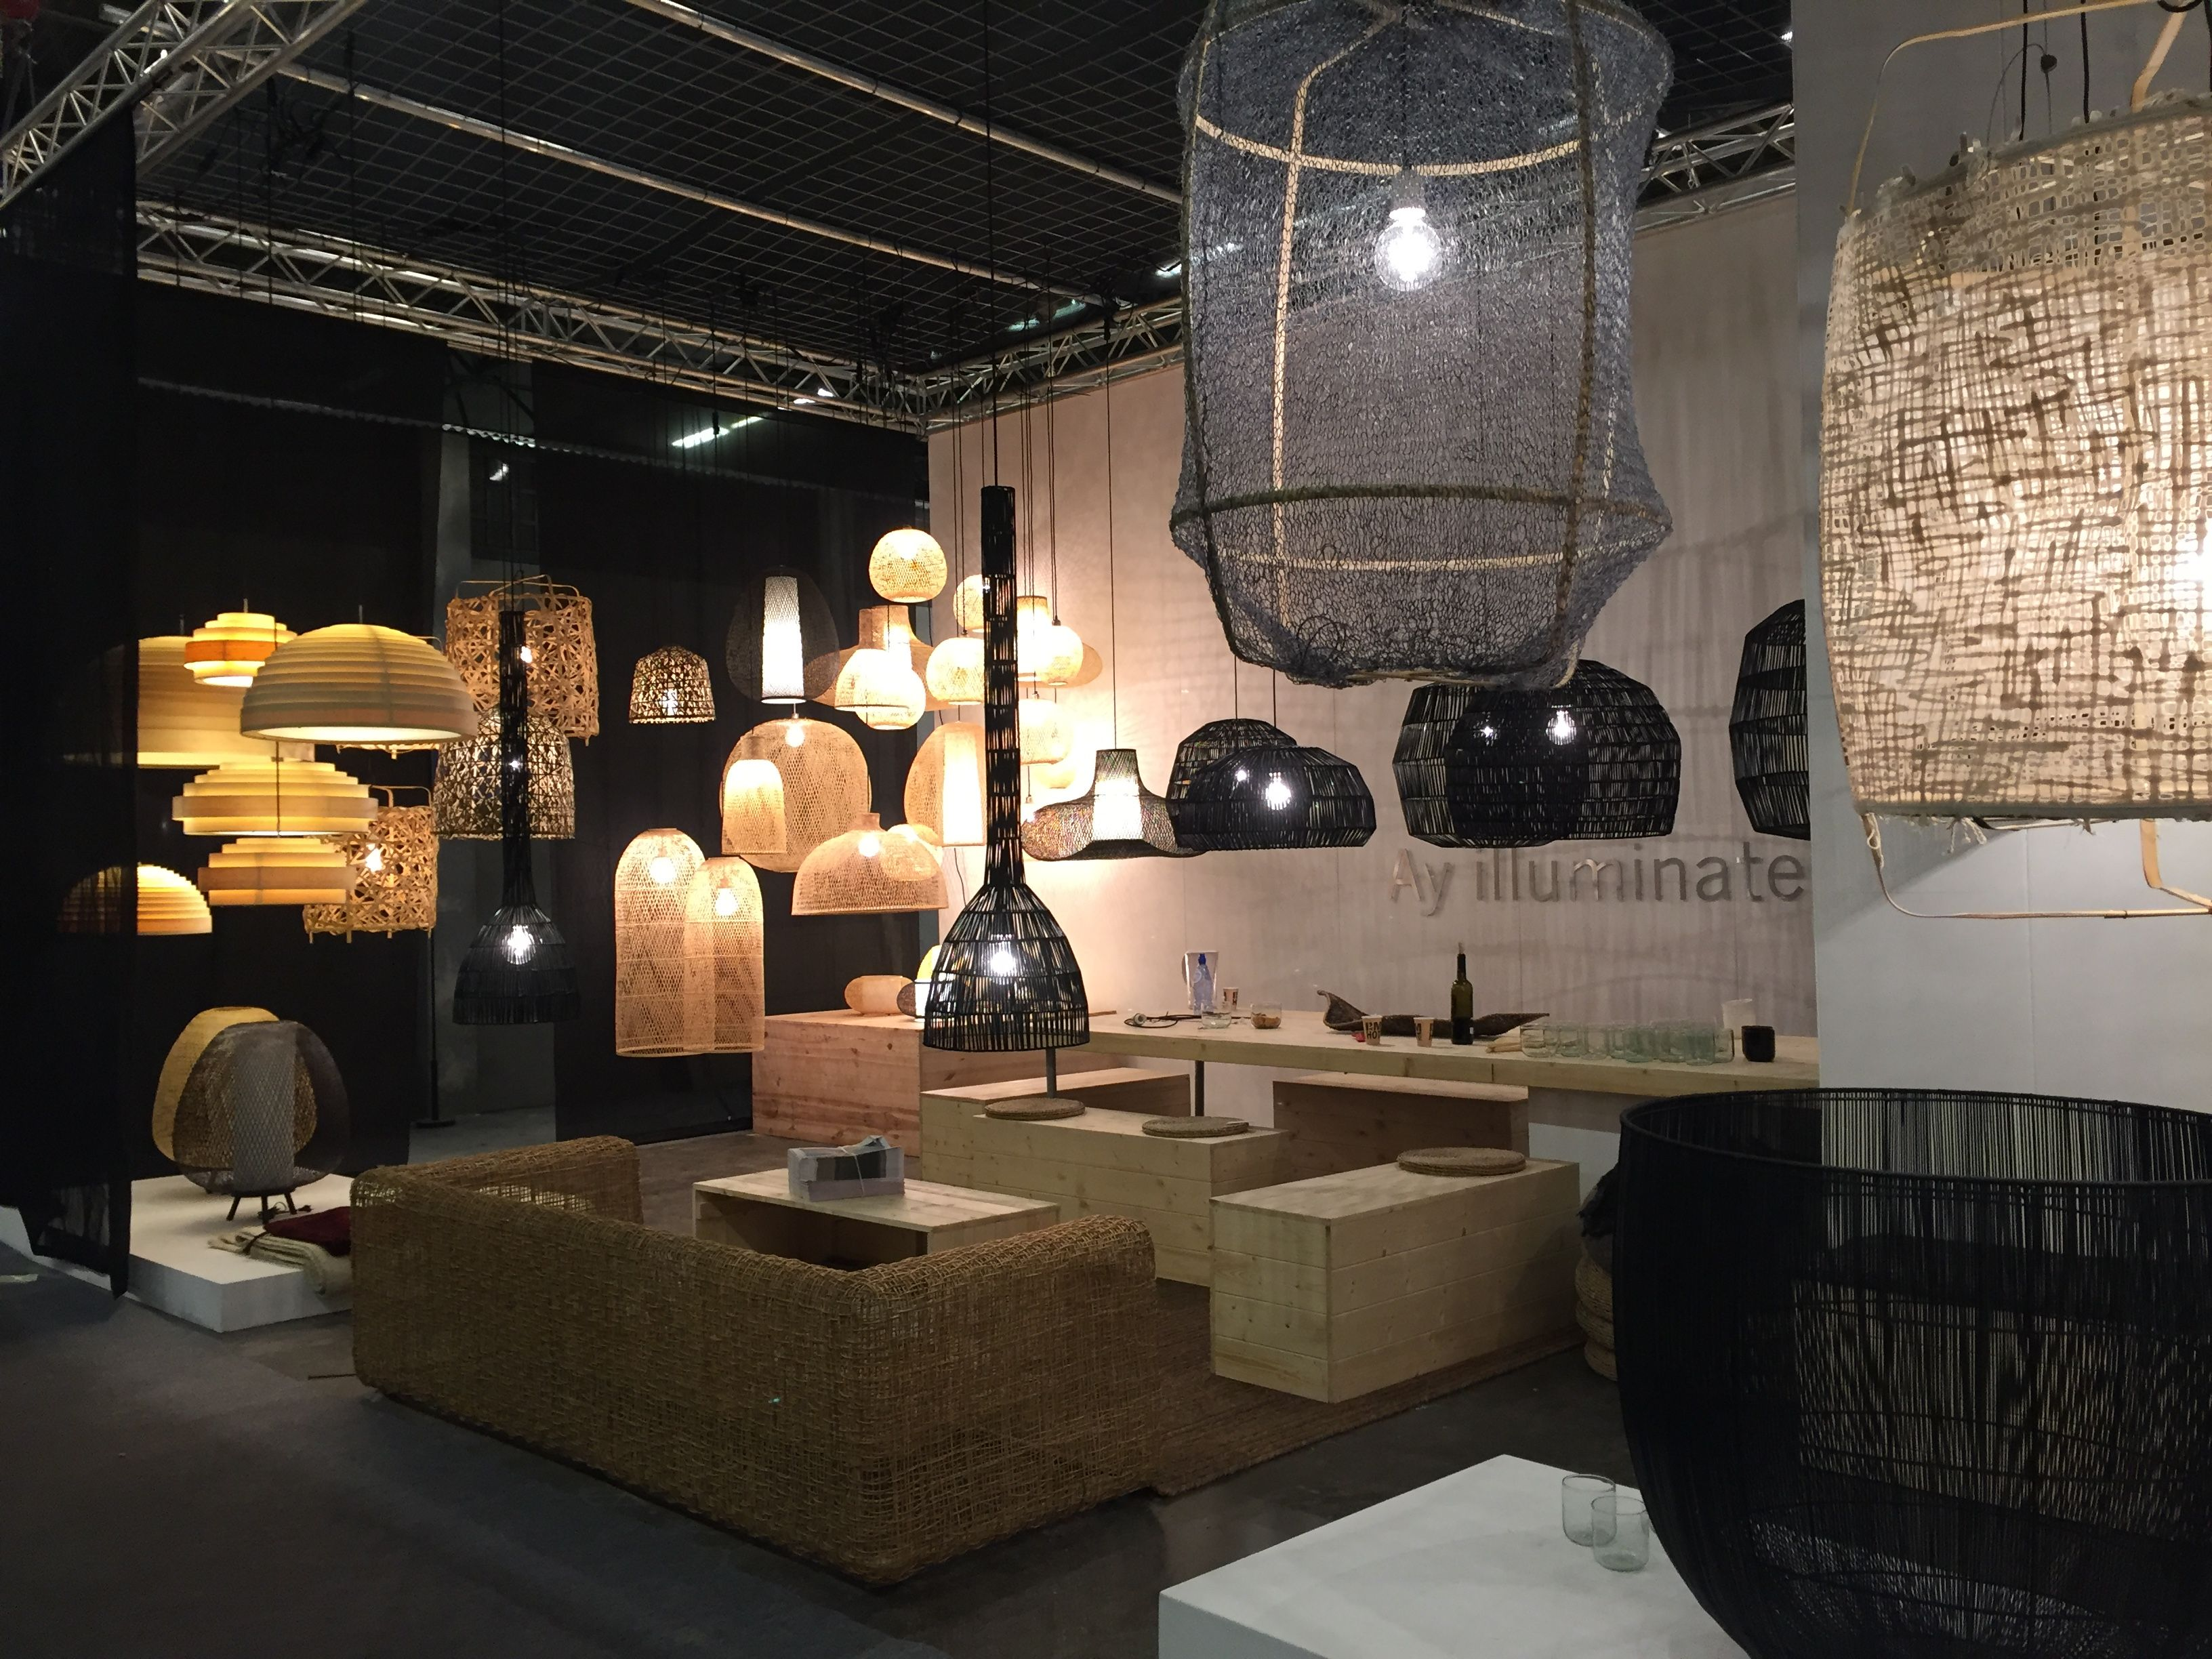 Design Ay Illuminate : Ay illuminate at maison&objet paris jan.2017 lamp. โคมไฟ pinterest